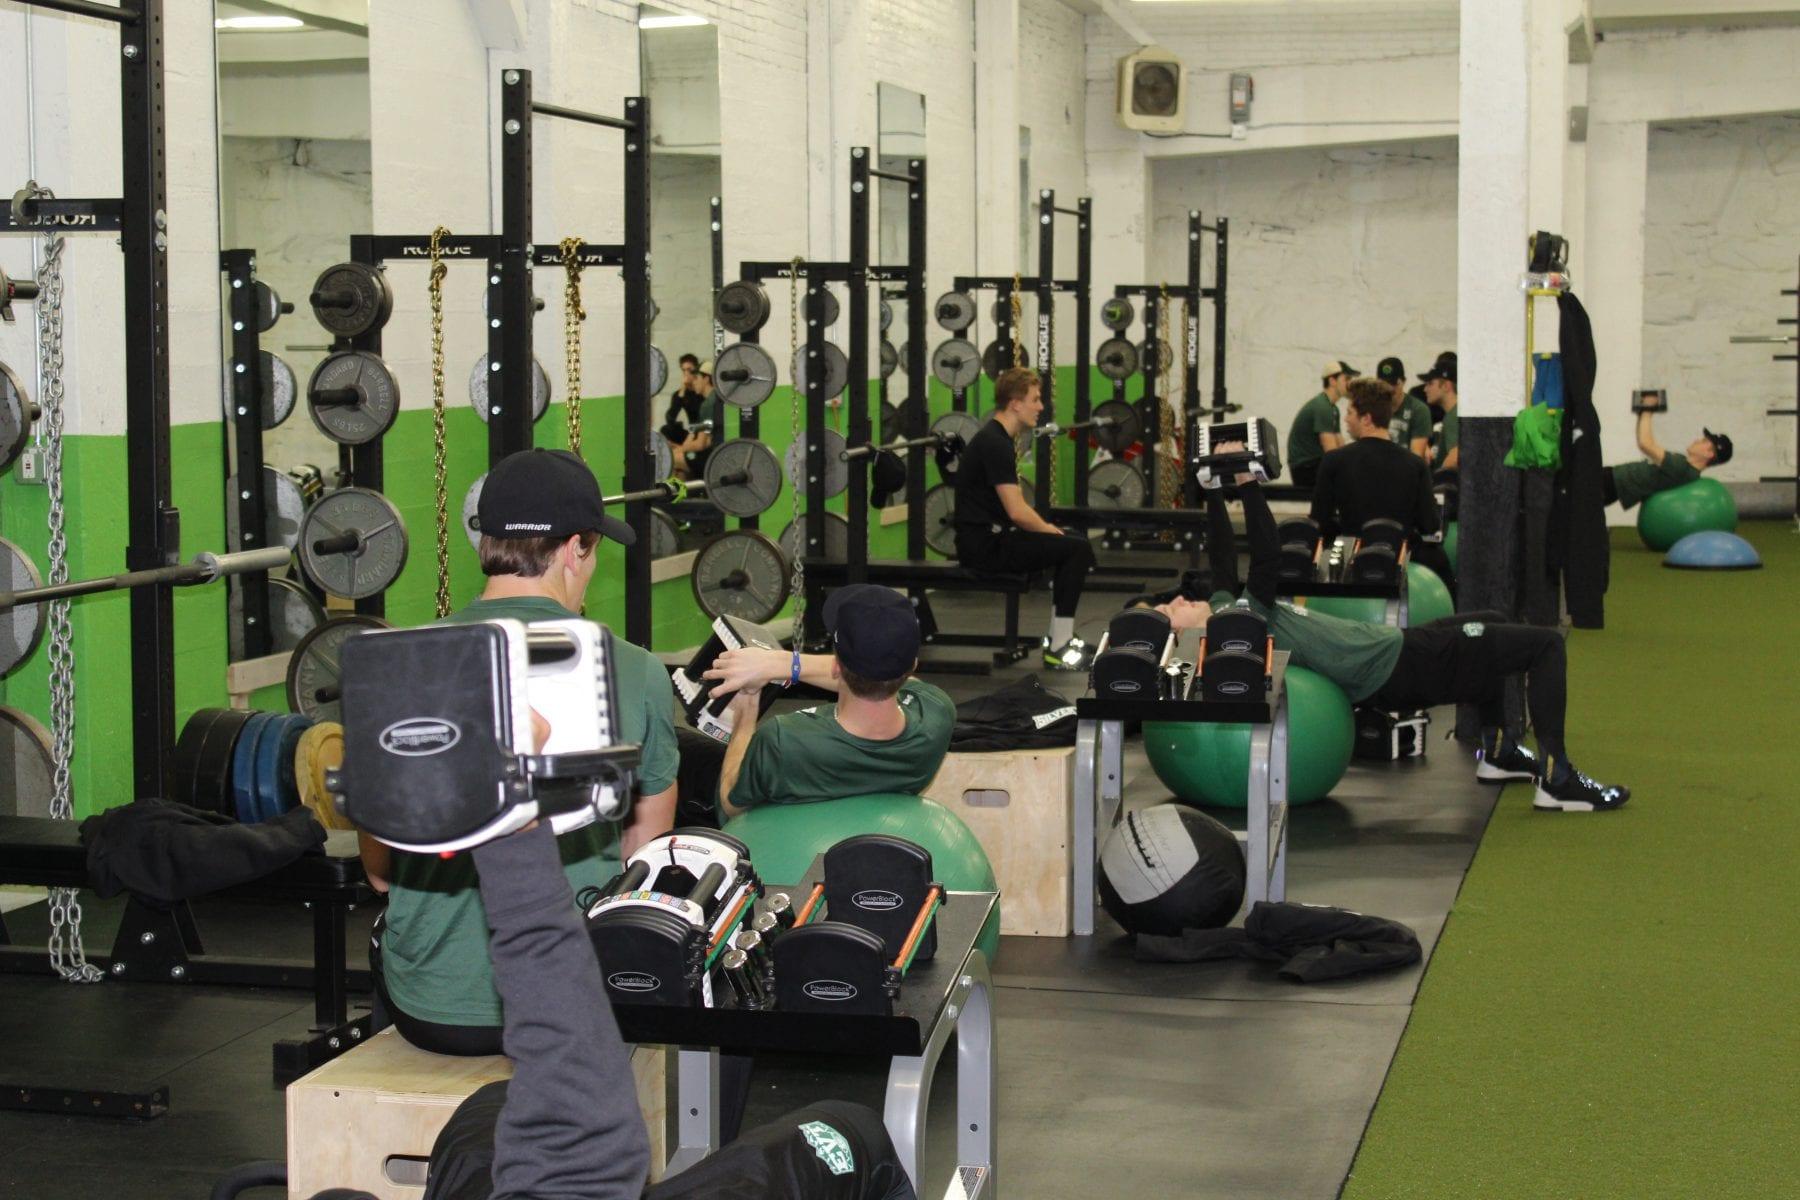 Sports Training Facility in Everett, WA | Engineered Sports